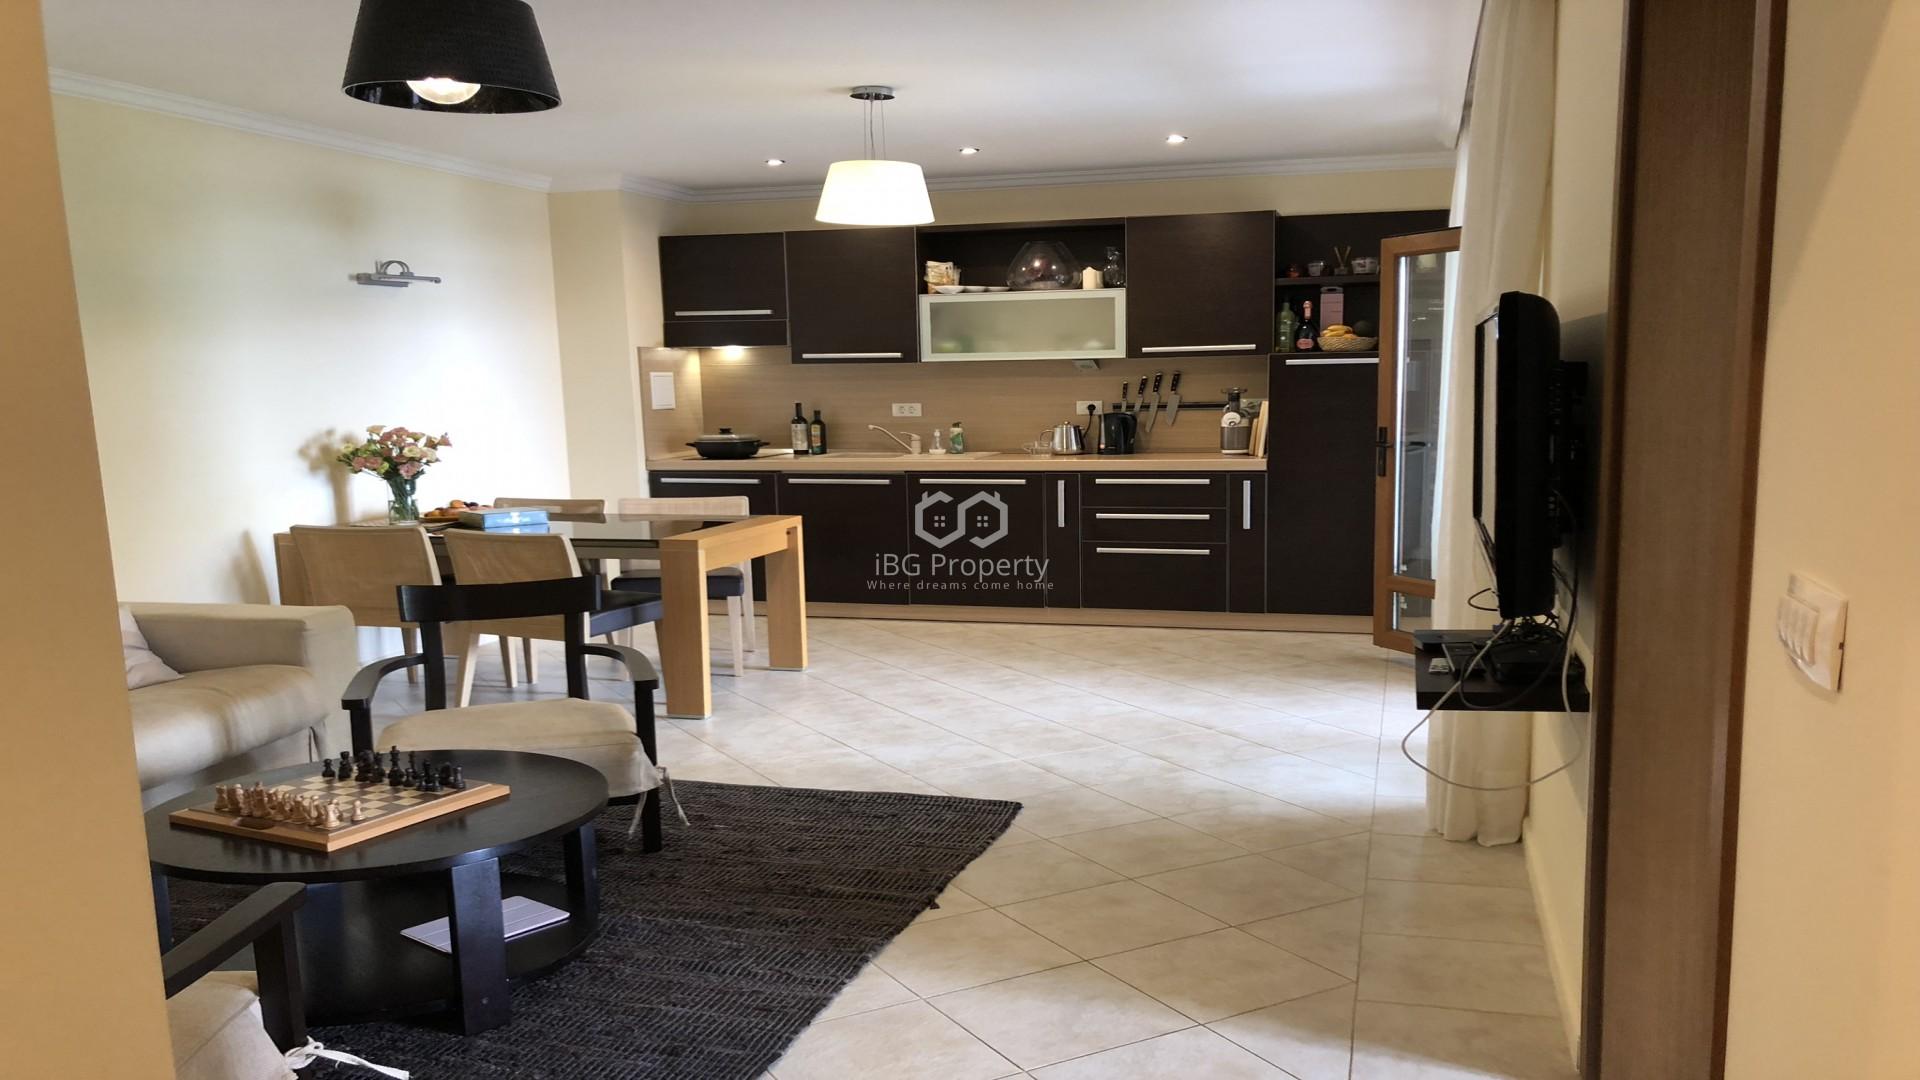 Двухкомнатная квартира Созопол 90,58 m2